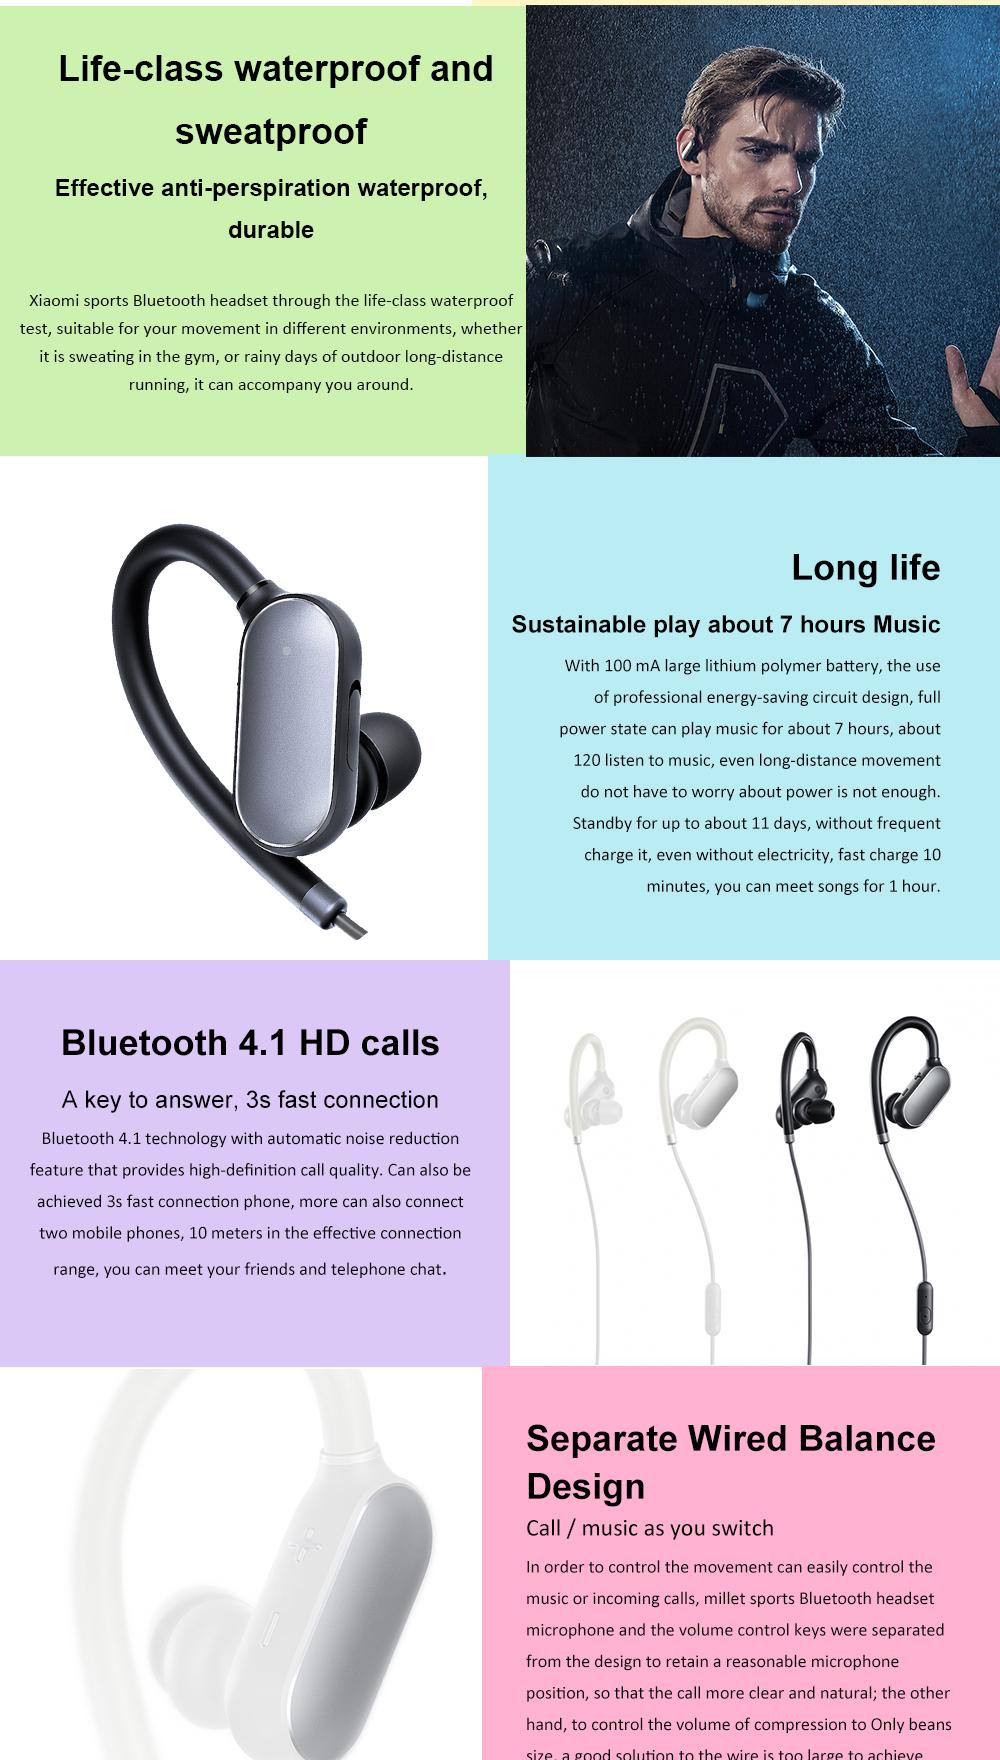 Original Xiaomi Mi Sport Bluetooth Headset Xiaomi Wireless Sports Earbuds IPX4 Waterproof Earphone for iPhone xiaomi phone